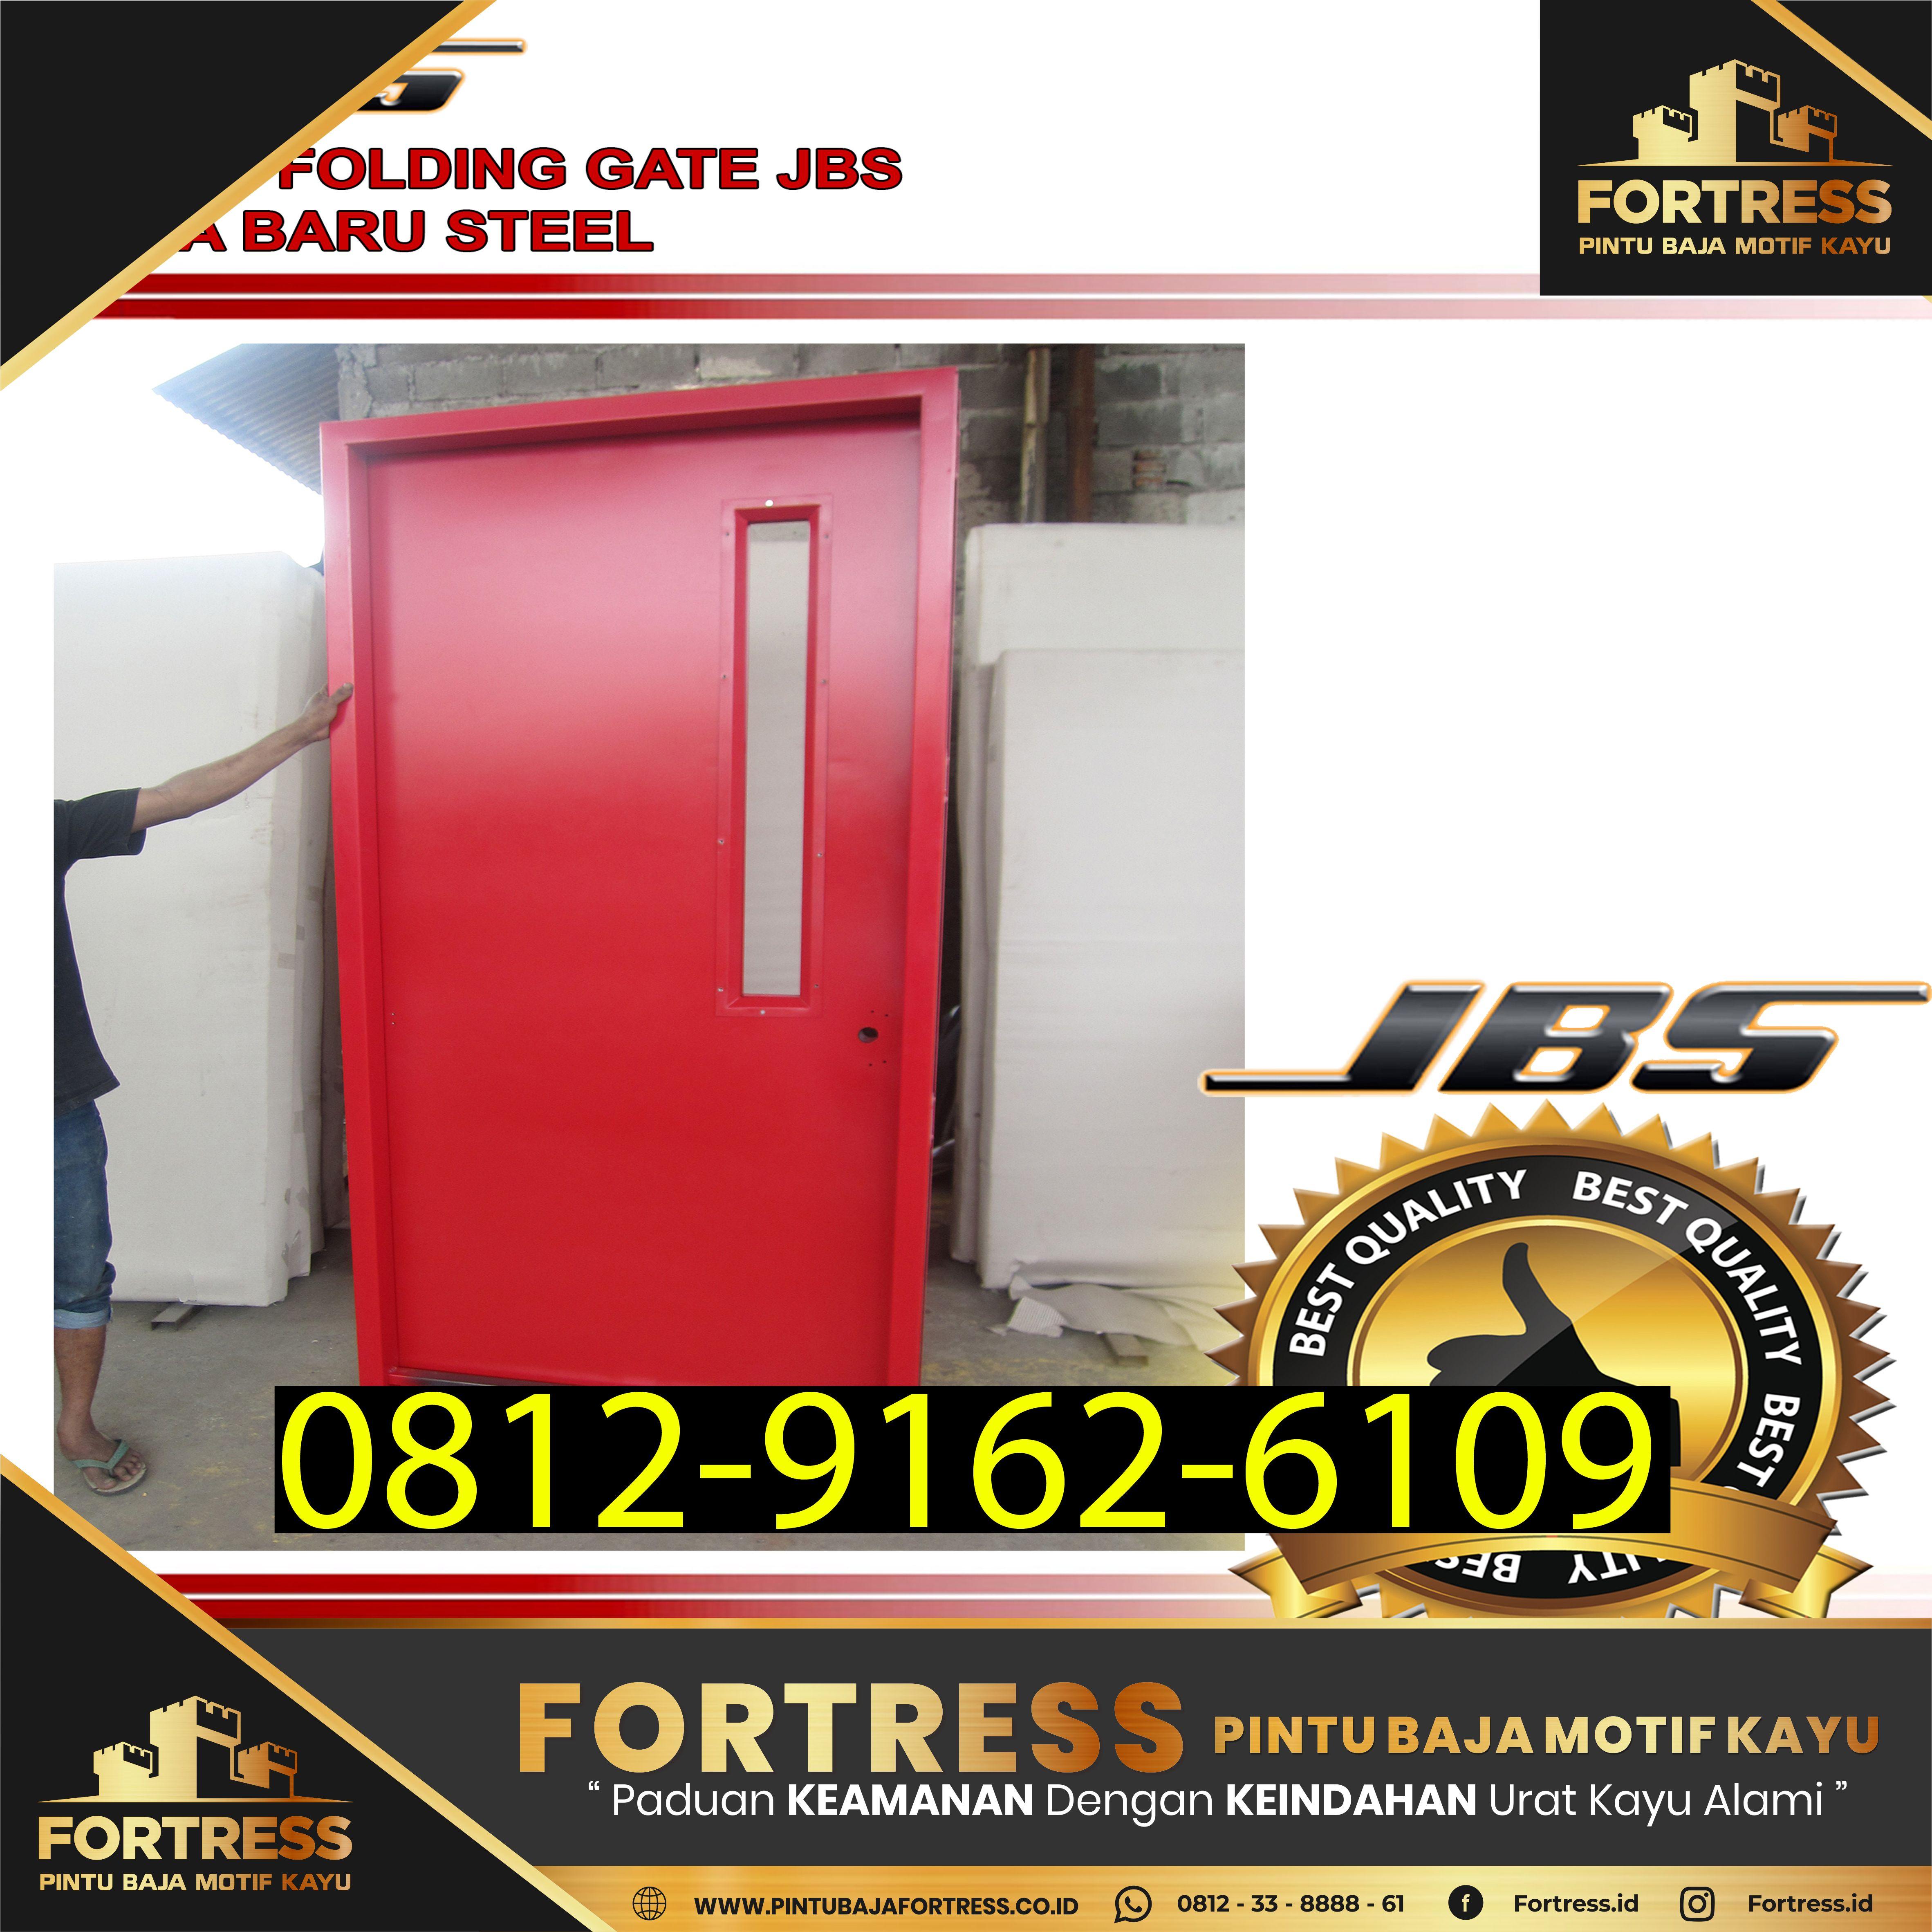 0812-9162-6108 (FORTRESS), fire-resistant emergency door price, key…